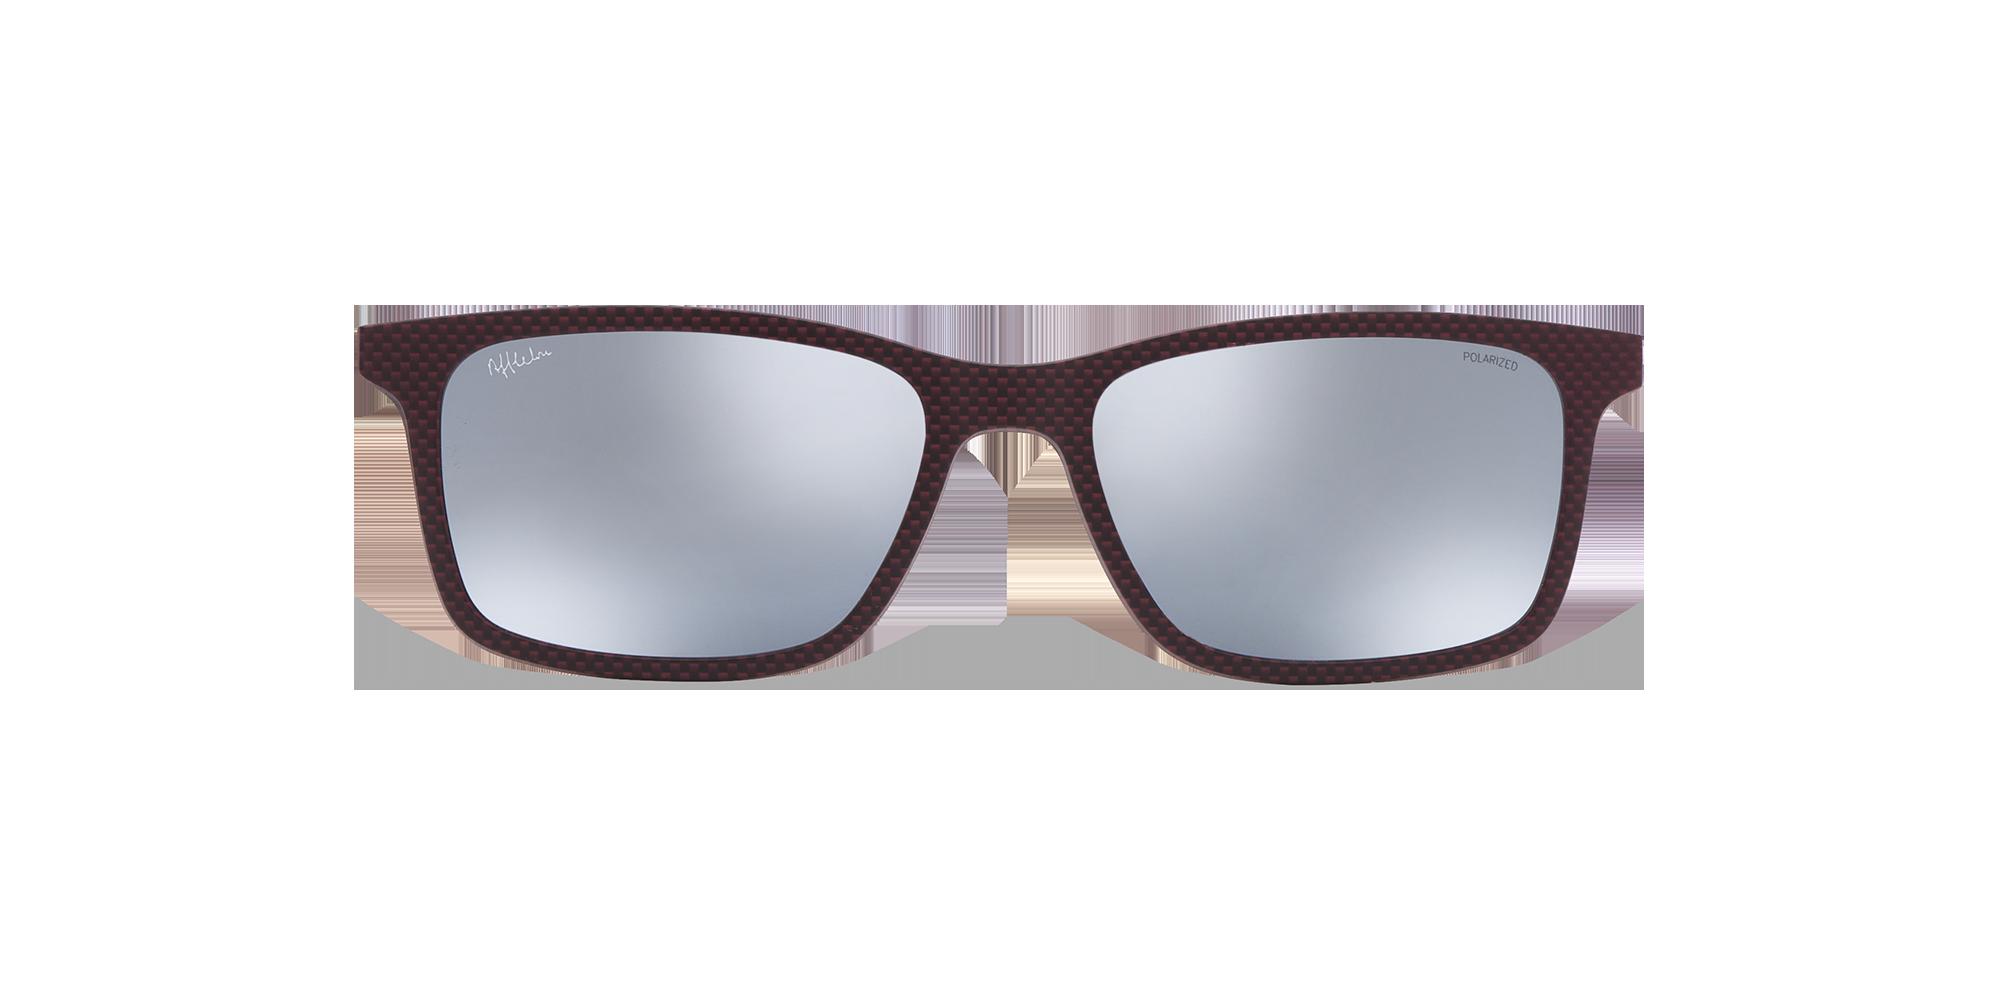 afflelou/france/products/smart_clip/clips_glasses/TMK32PRRD015316.png